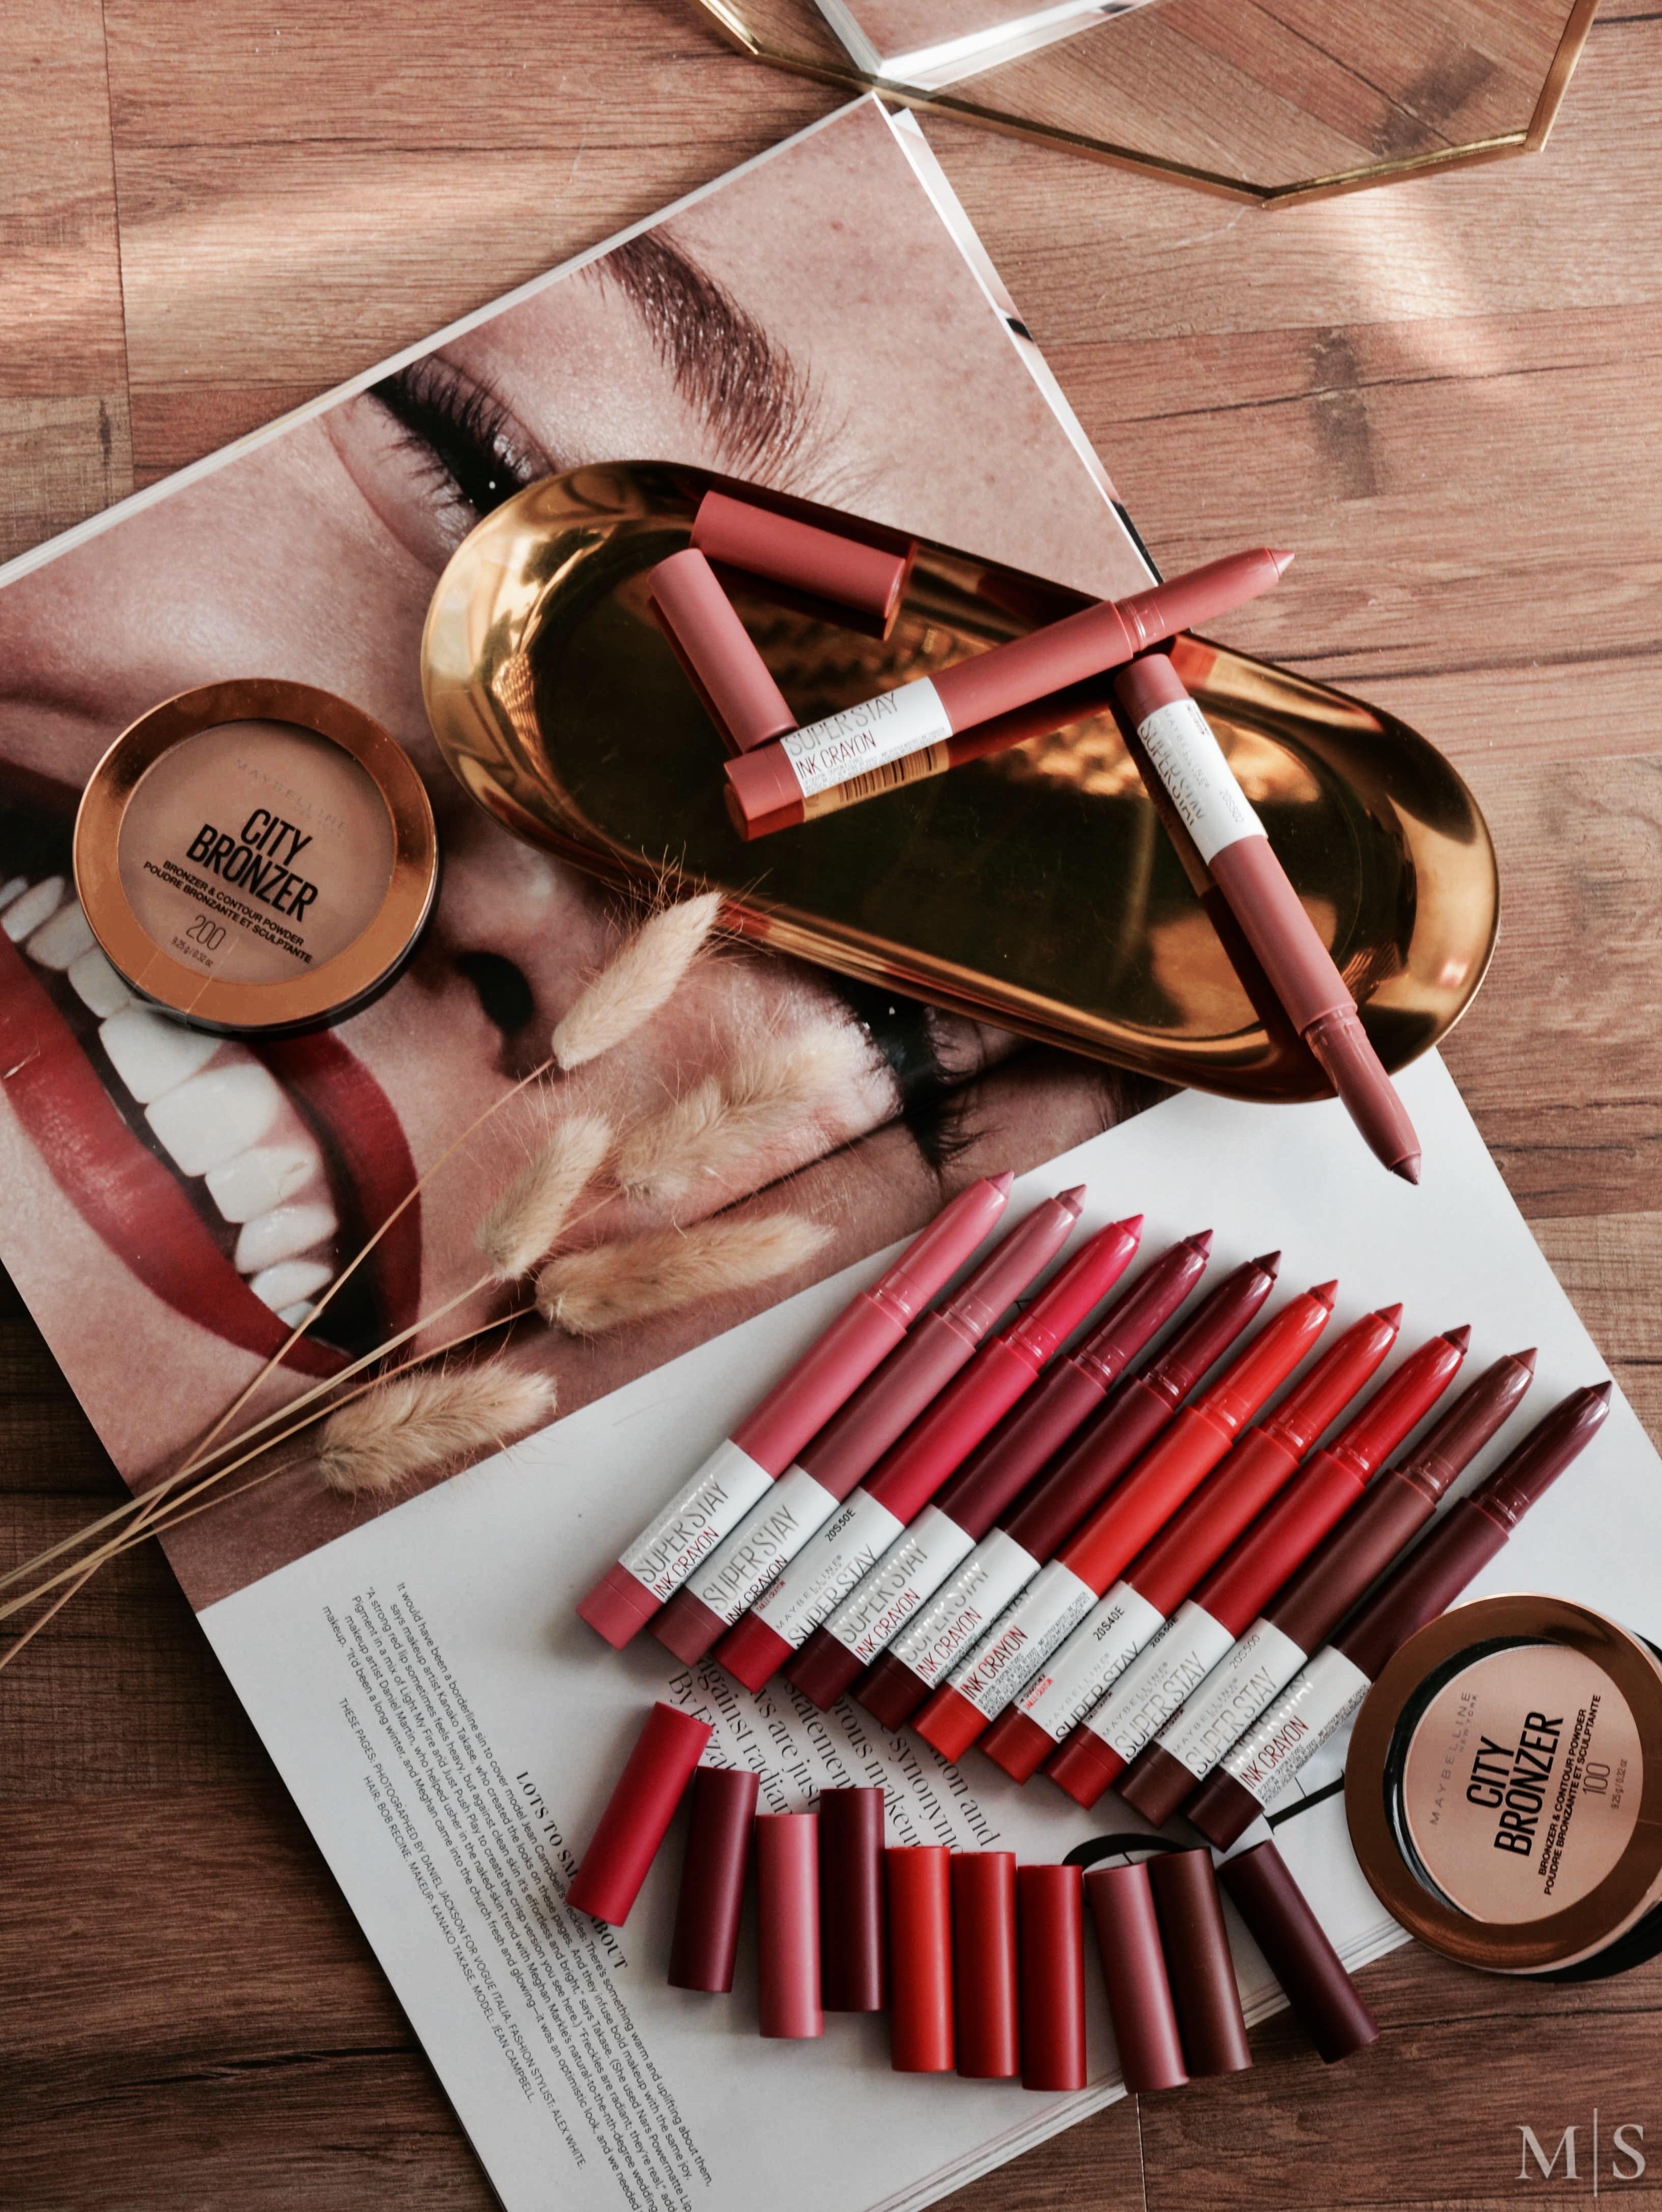 Maybelline Superstay Ink Crayon Lipstick